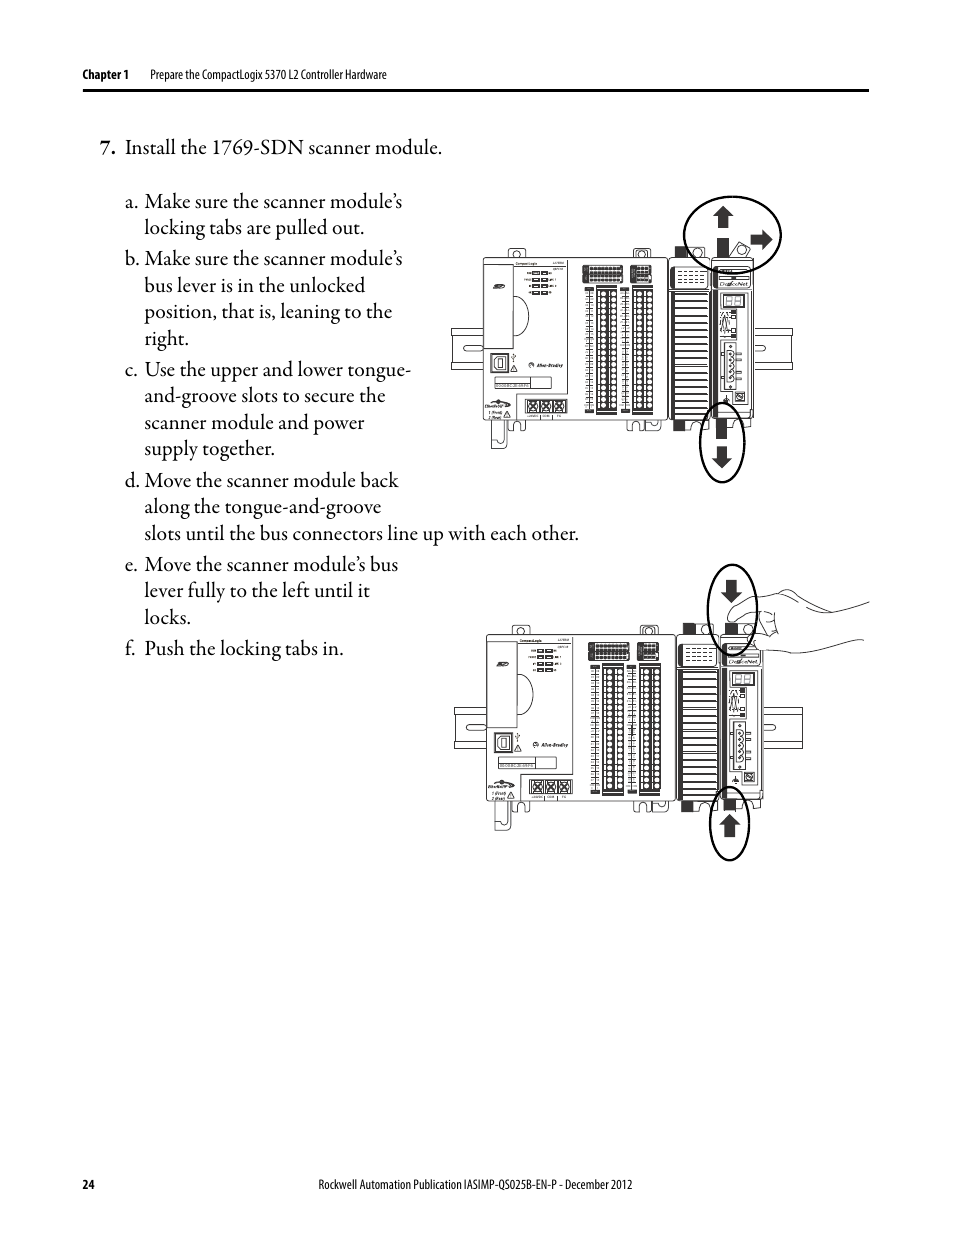 Dc In Hsc Dc Out Analog Rockwell Automation 1769 L24er Qb1b L24er Qbfc1b L27erm Qbfc1b Compactlogix 5370 L2 Controllers Quick Start User Manual Page 24 86 Original Mode